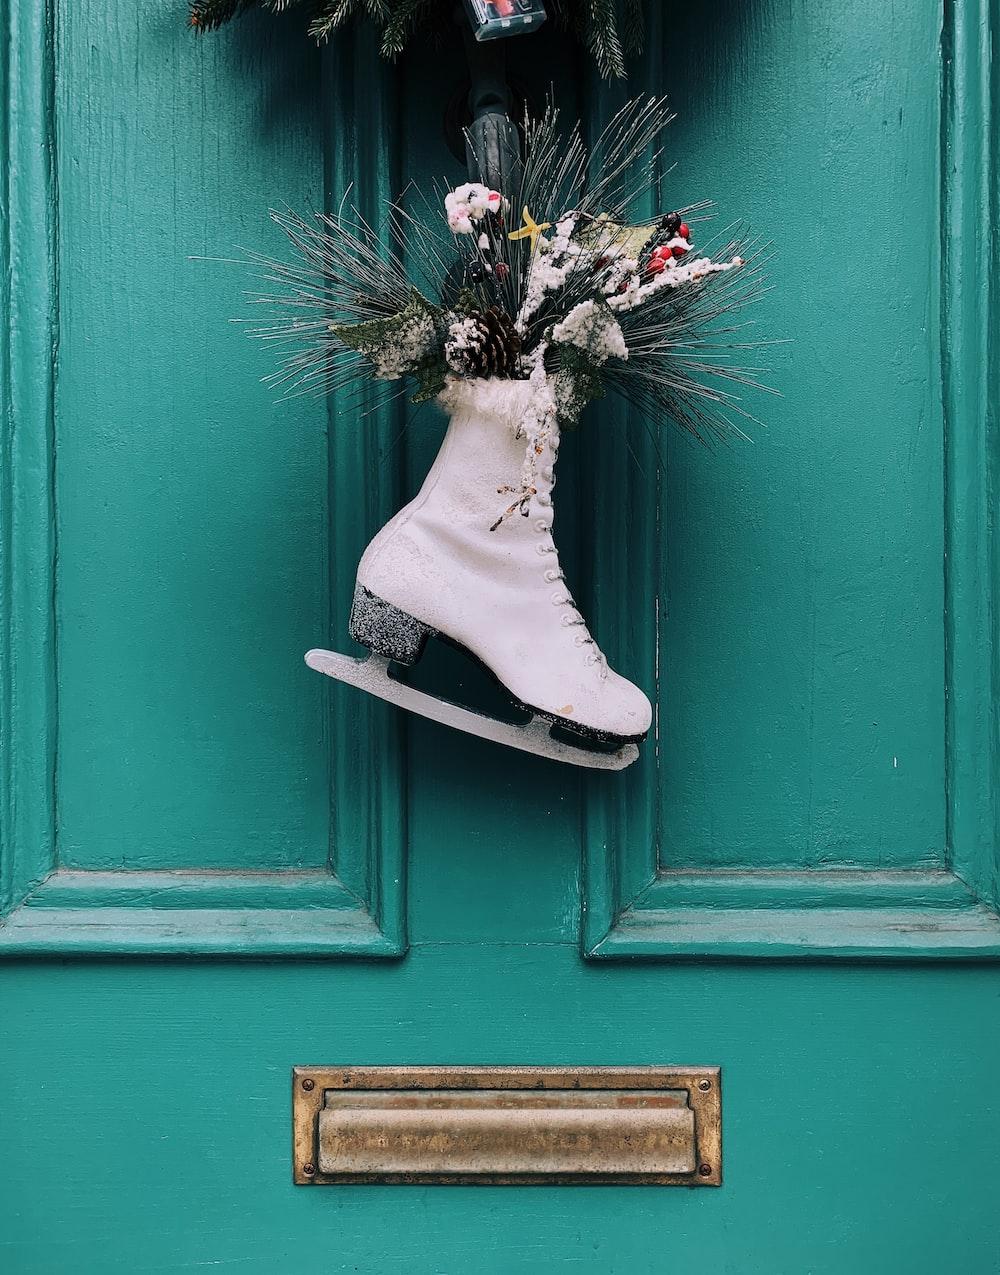 white figure skate wreath